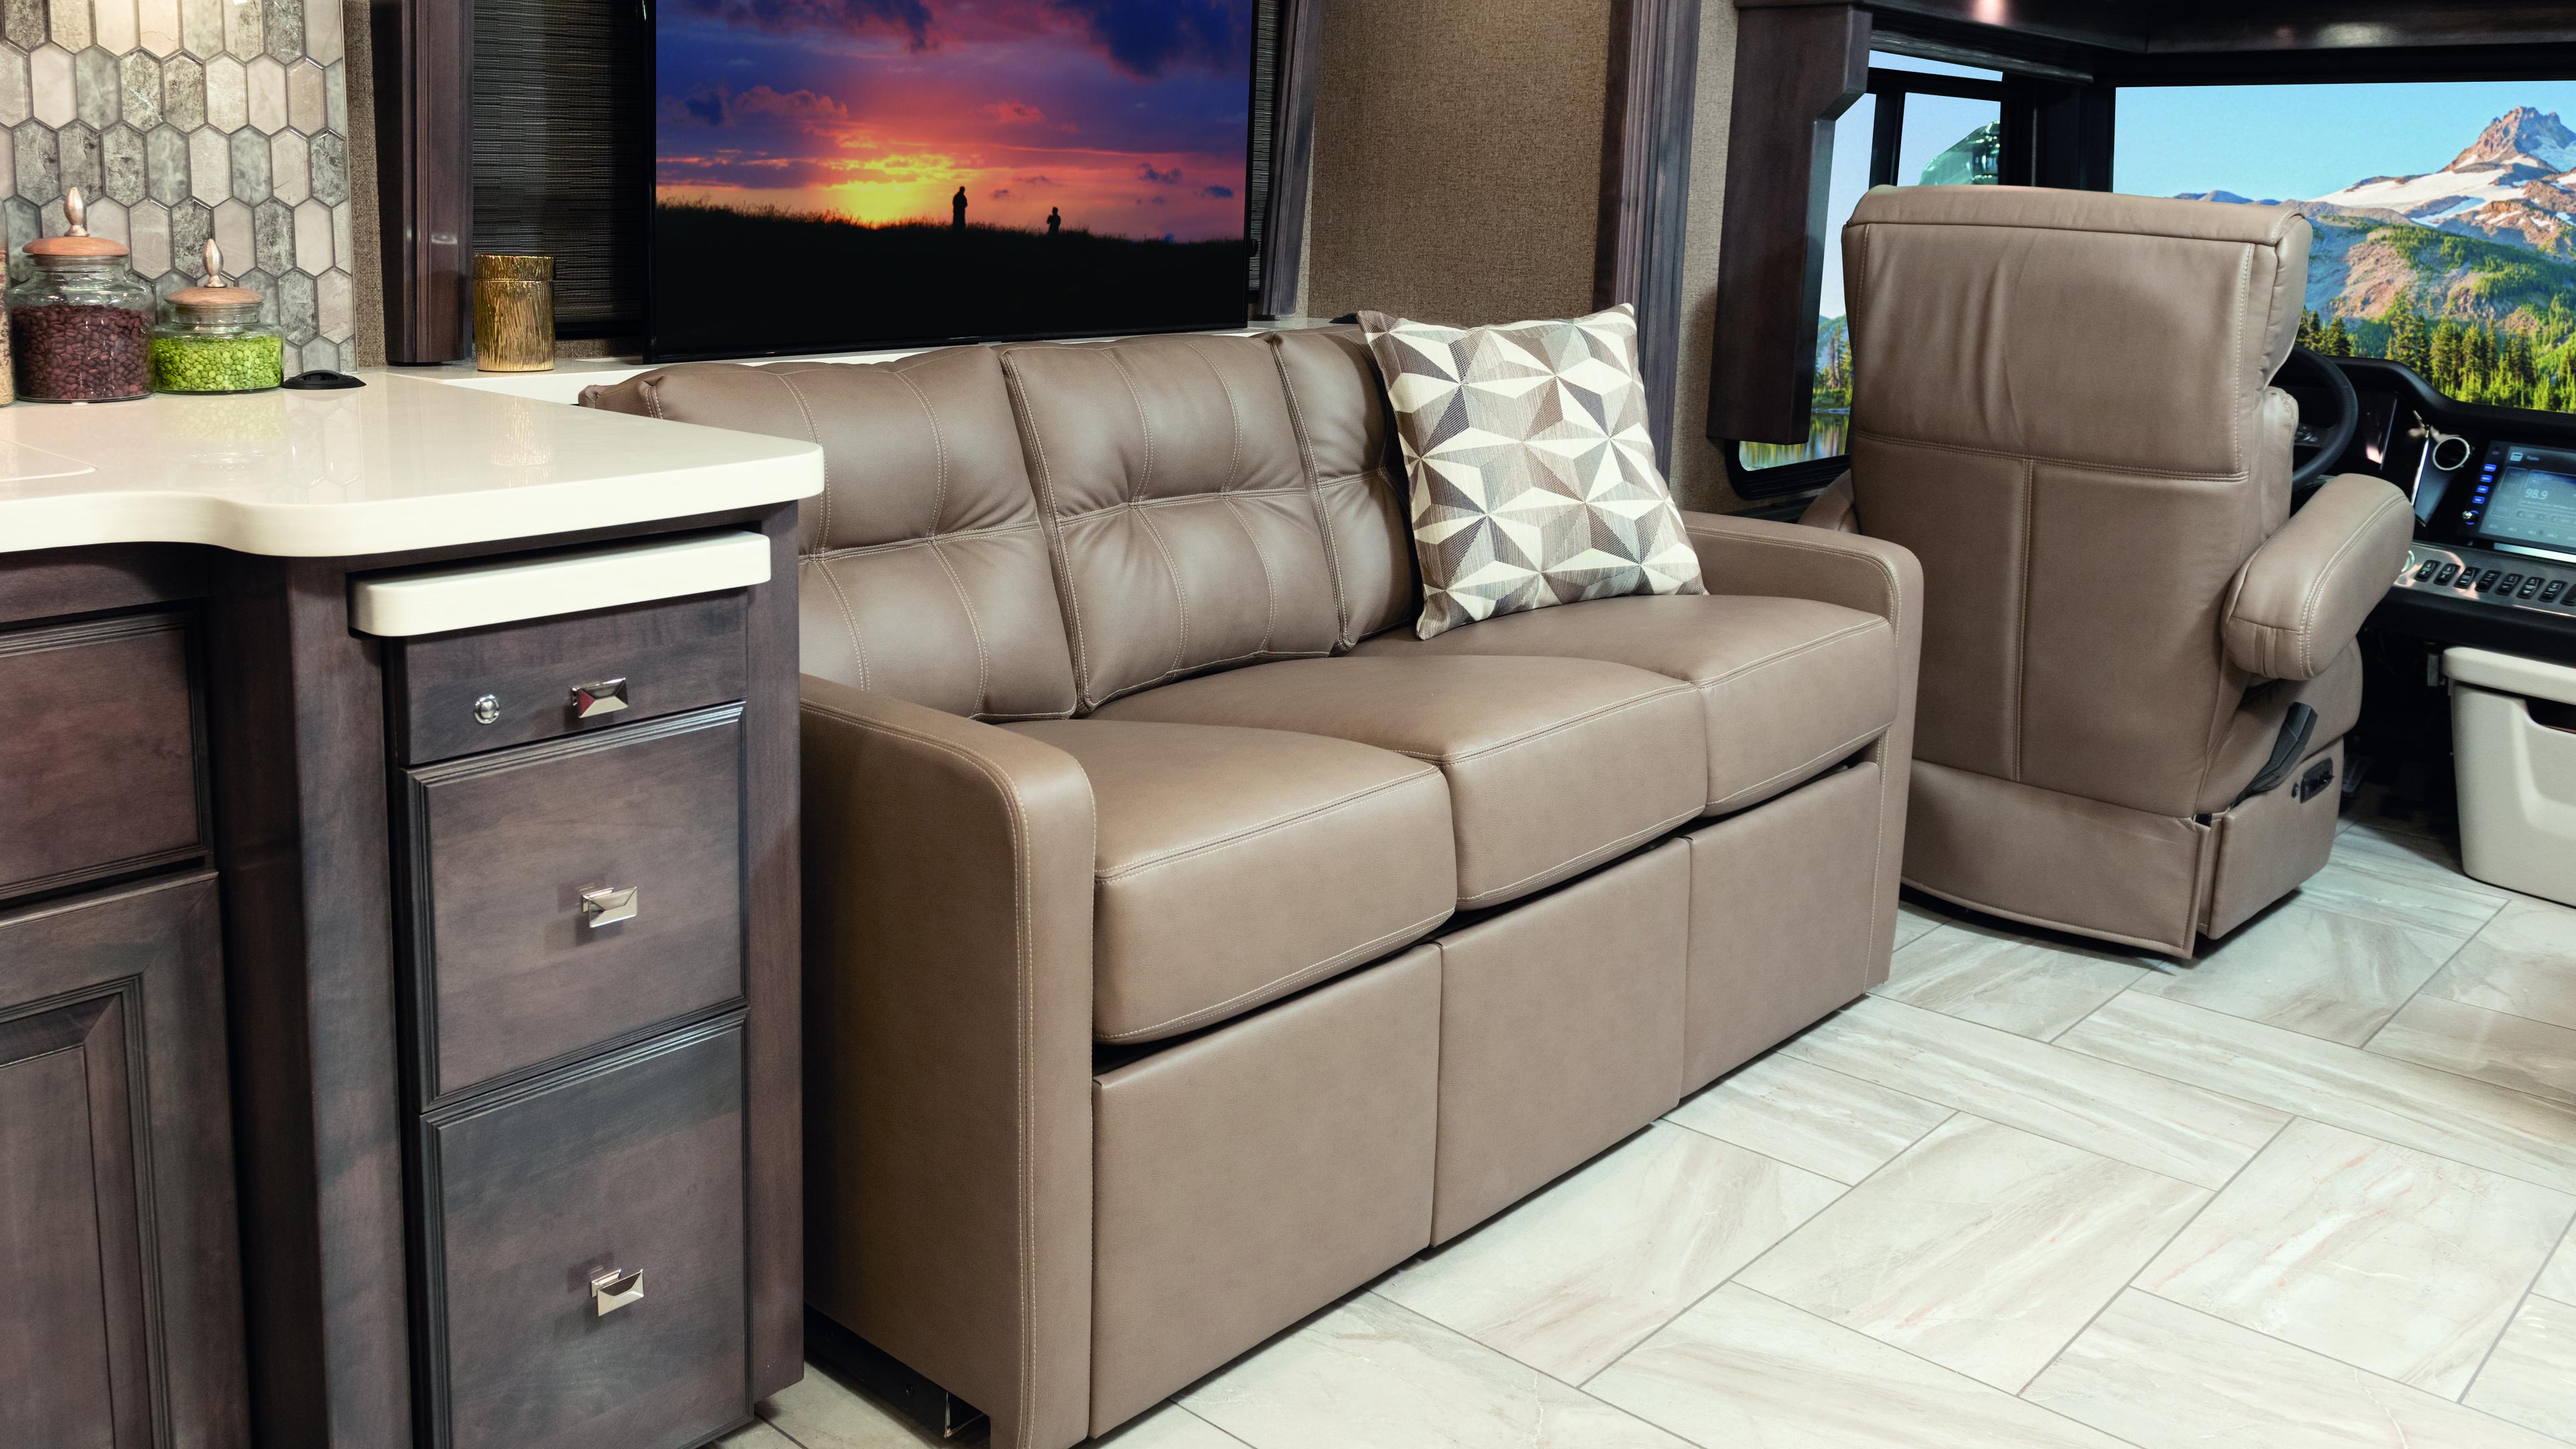 7 Sofa Driversidew TV Tradition42 V Salted Caramel SB Cab TVUP